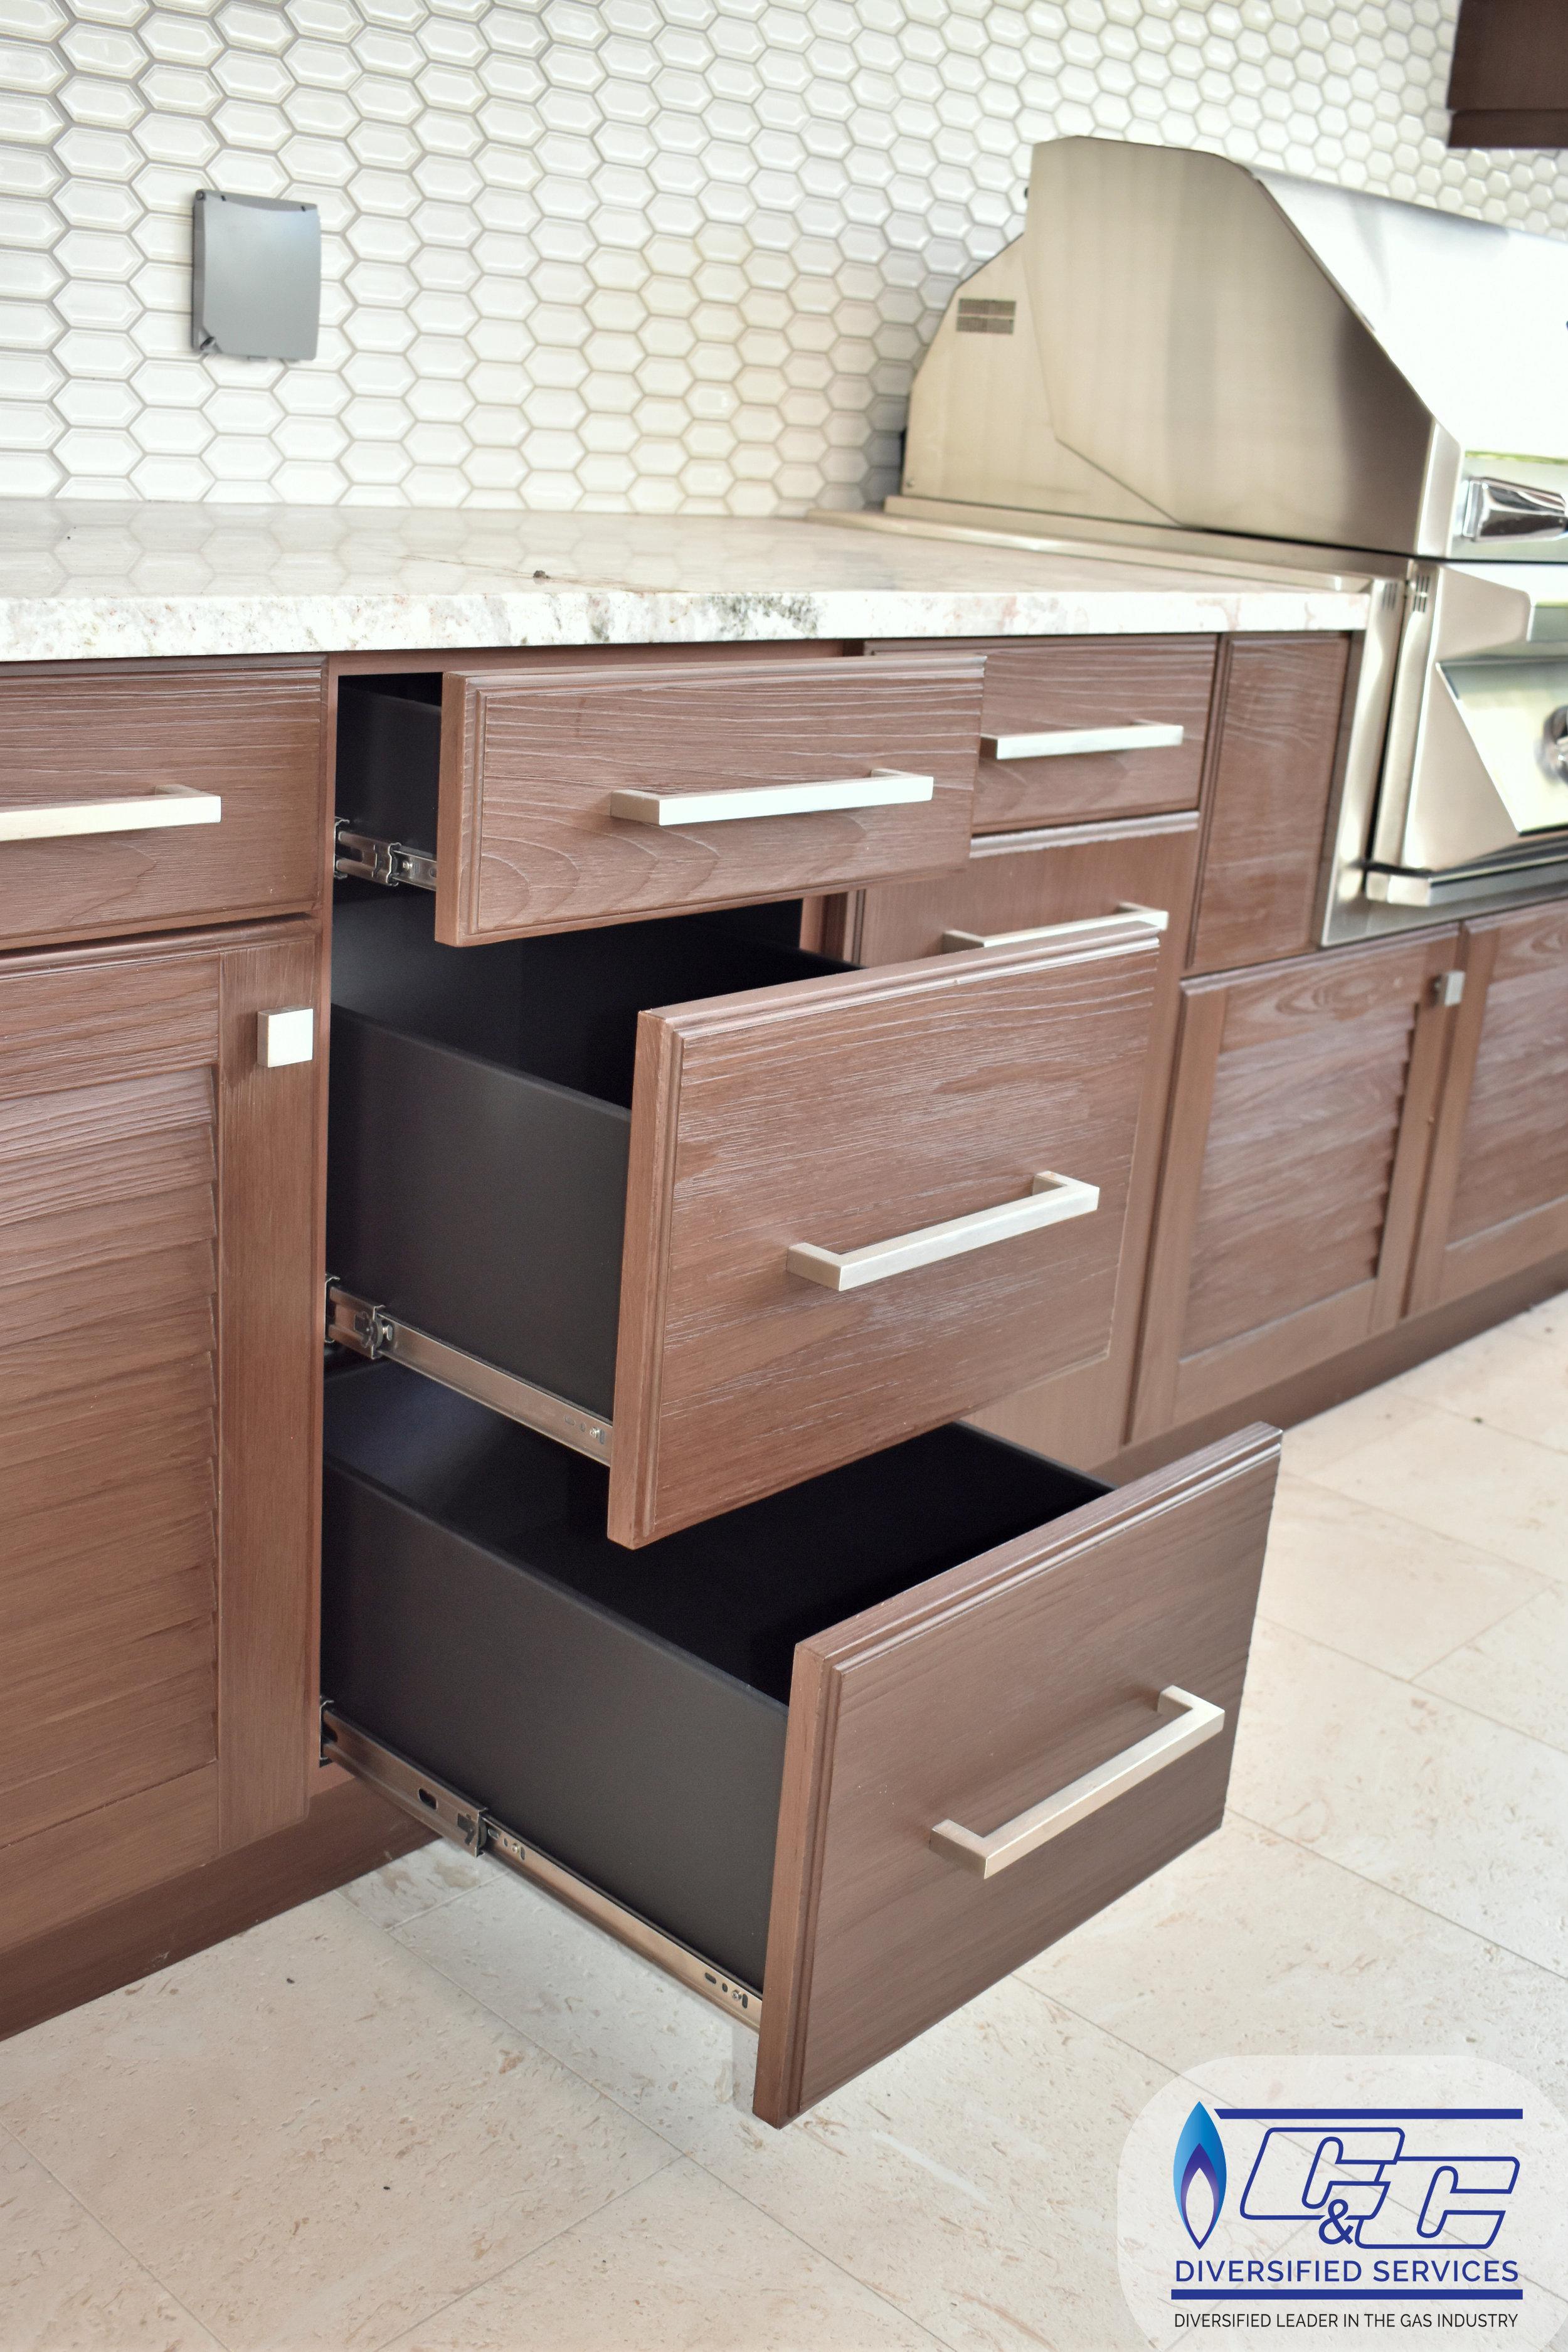 NatureKast Weatherproof Cabinetry - Drawers